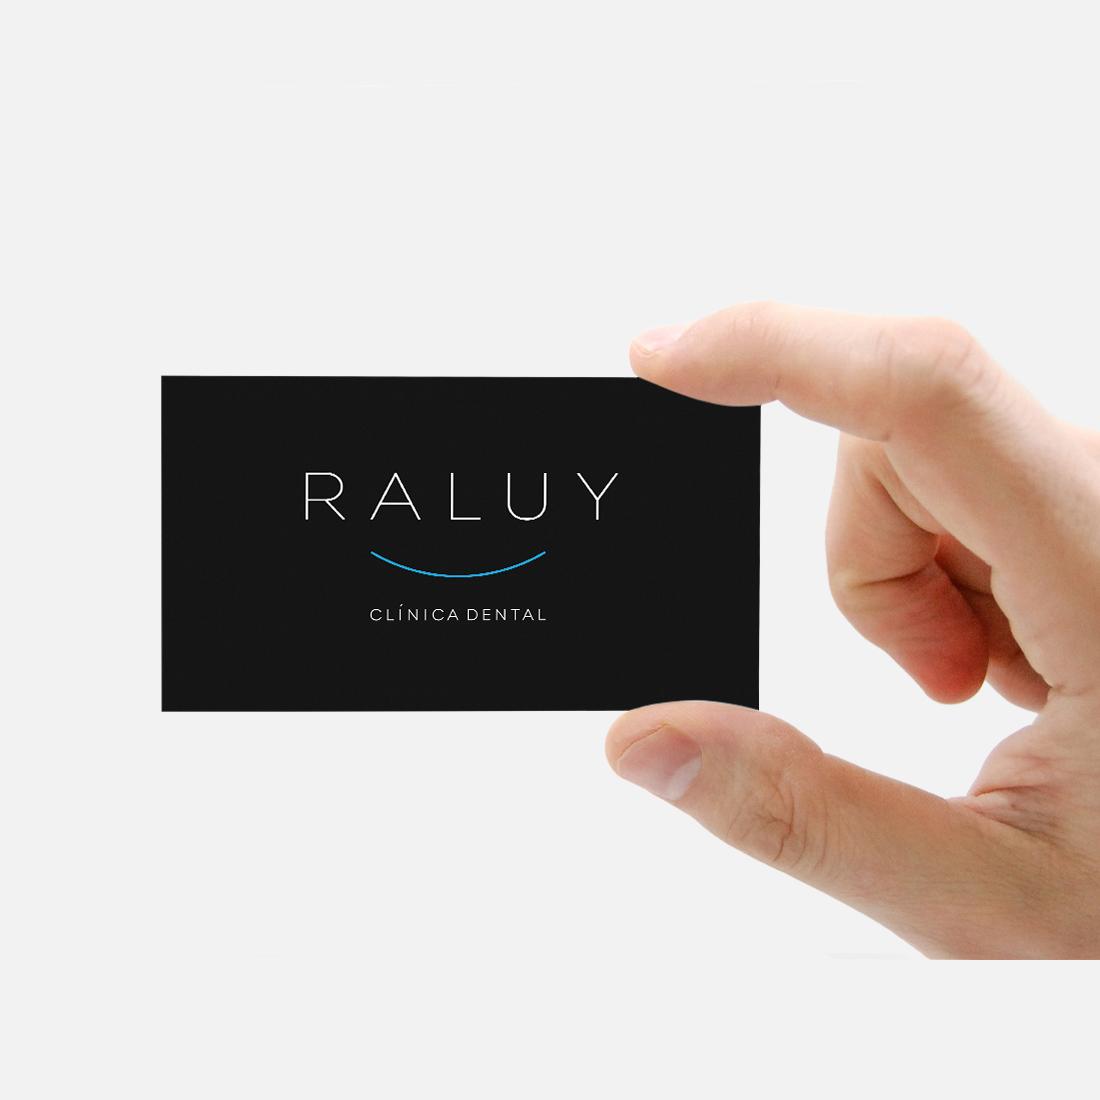 Clínica Dental Raluy